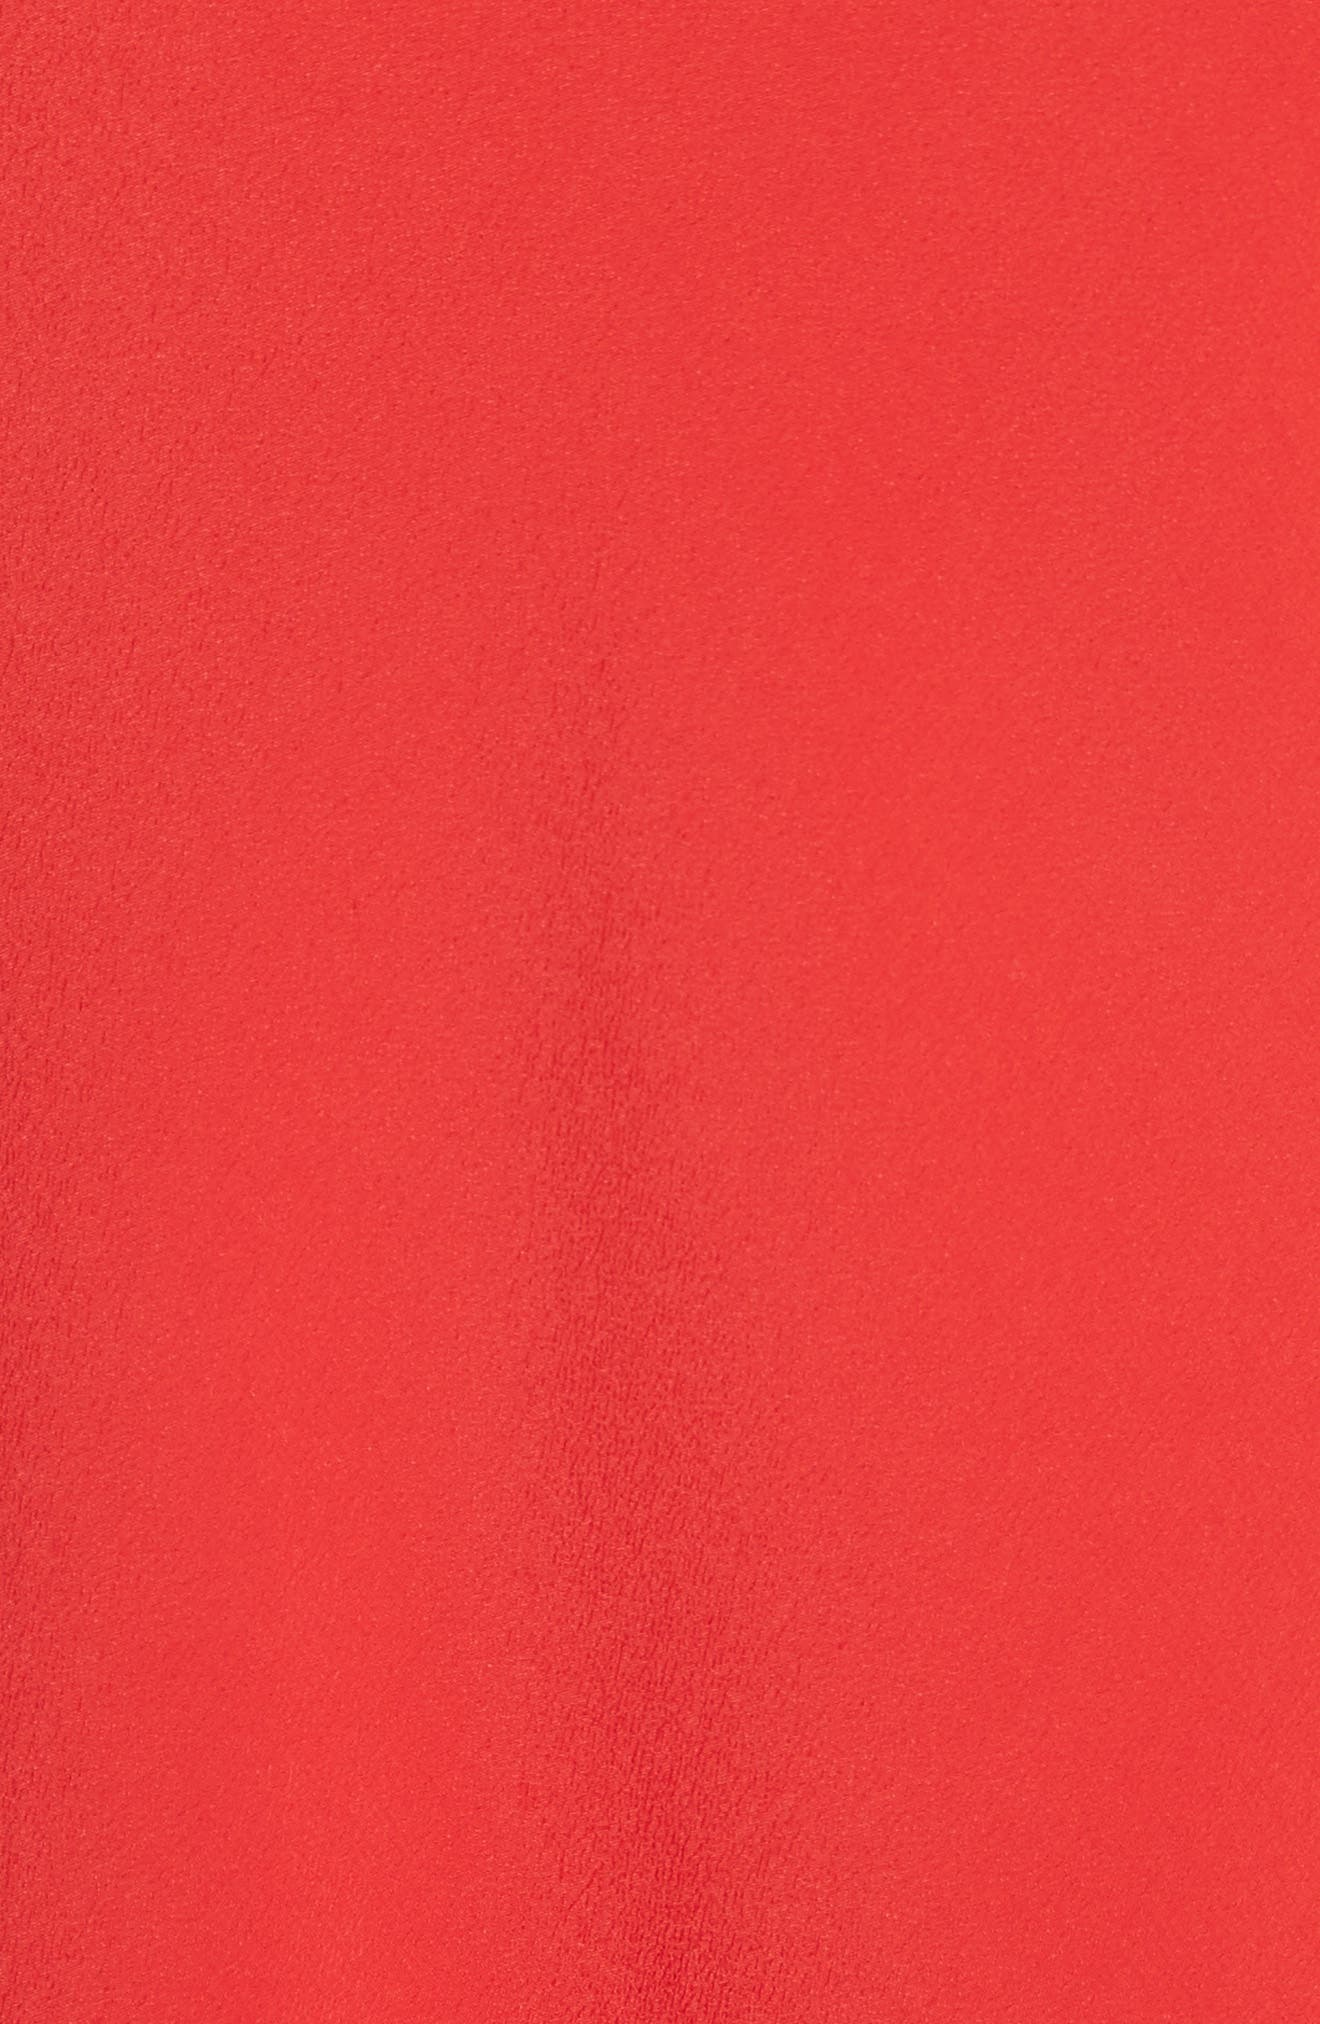 Ruffle Trim A-Line Dress,                             Alternate thumbnail 5, color,                             Red